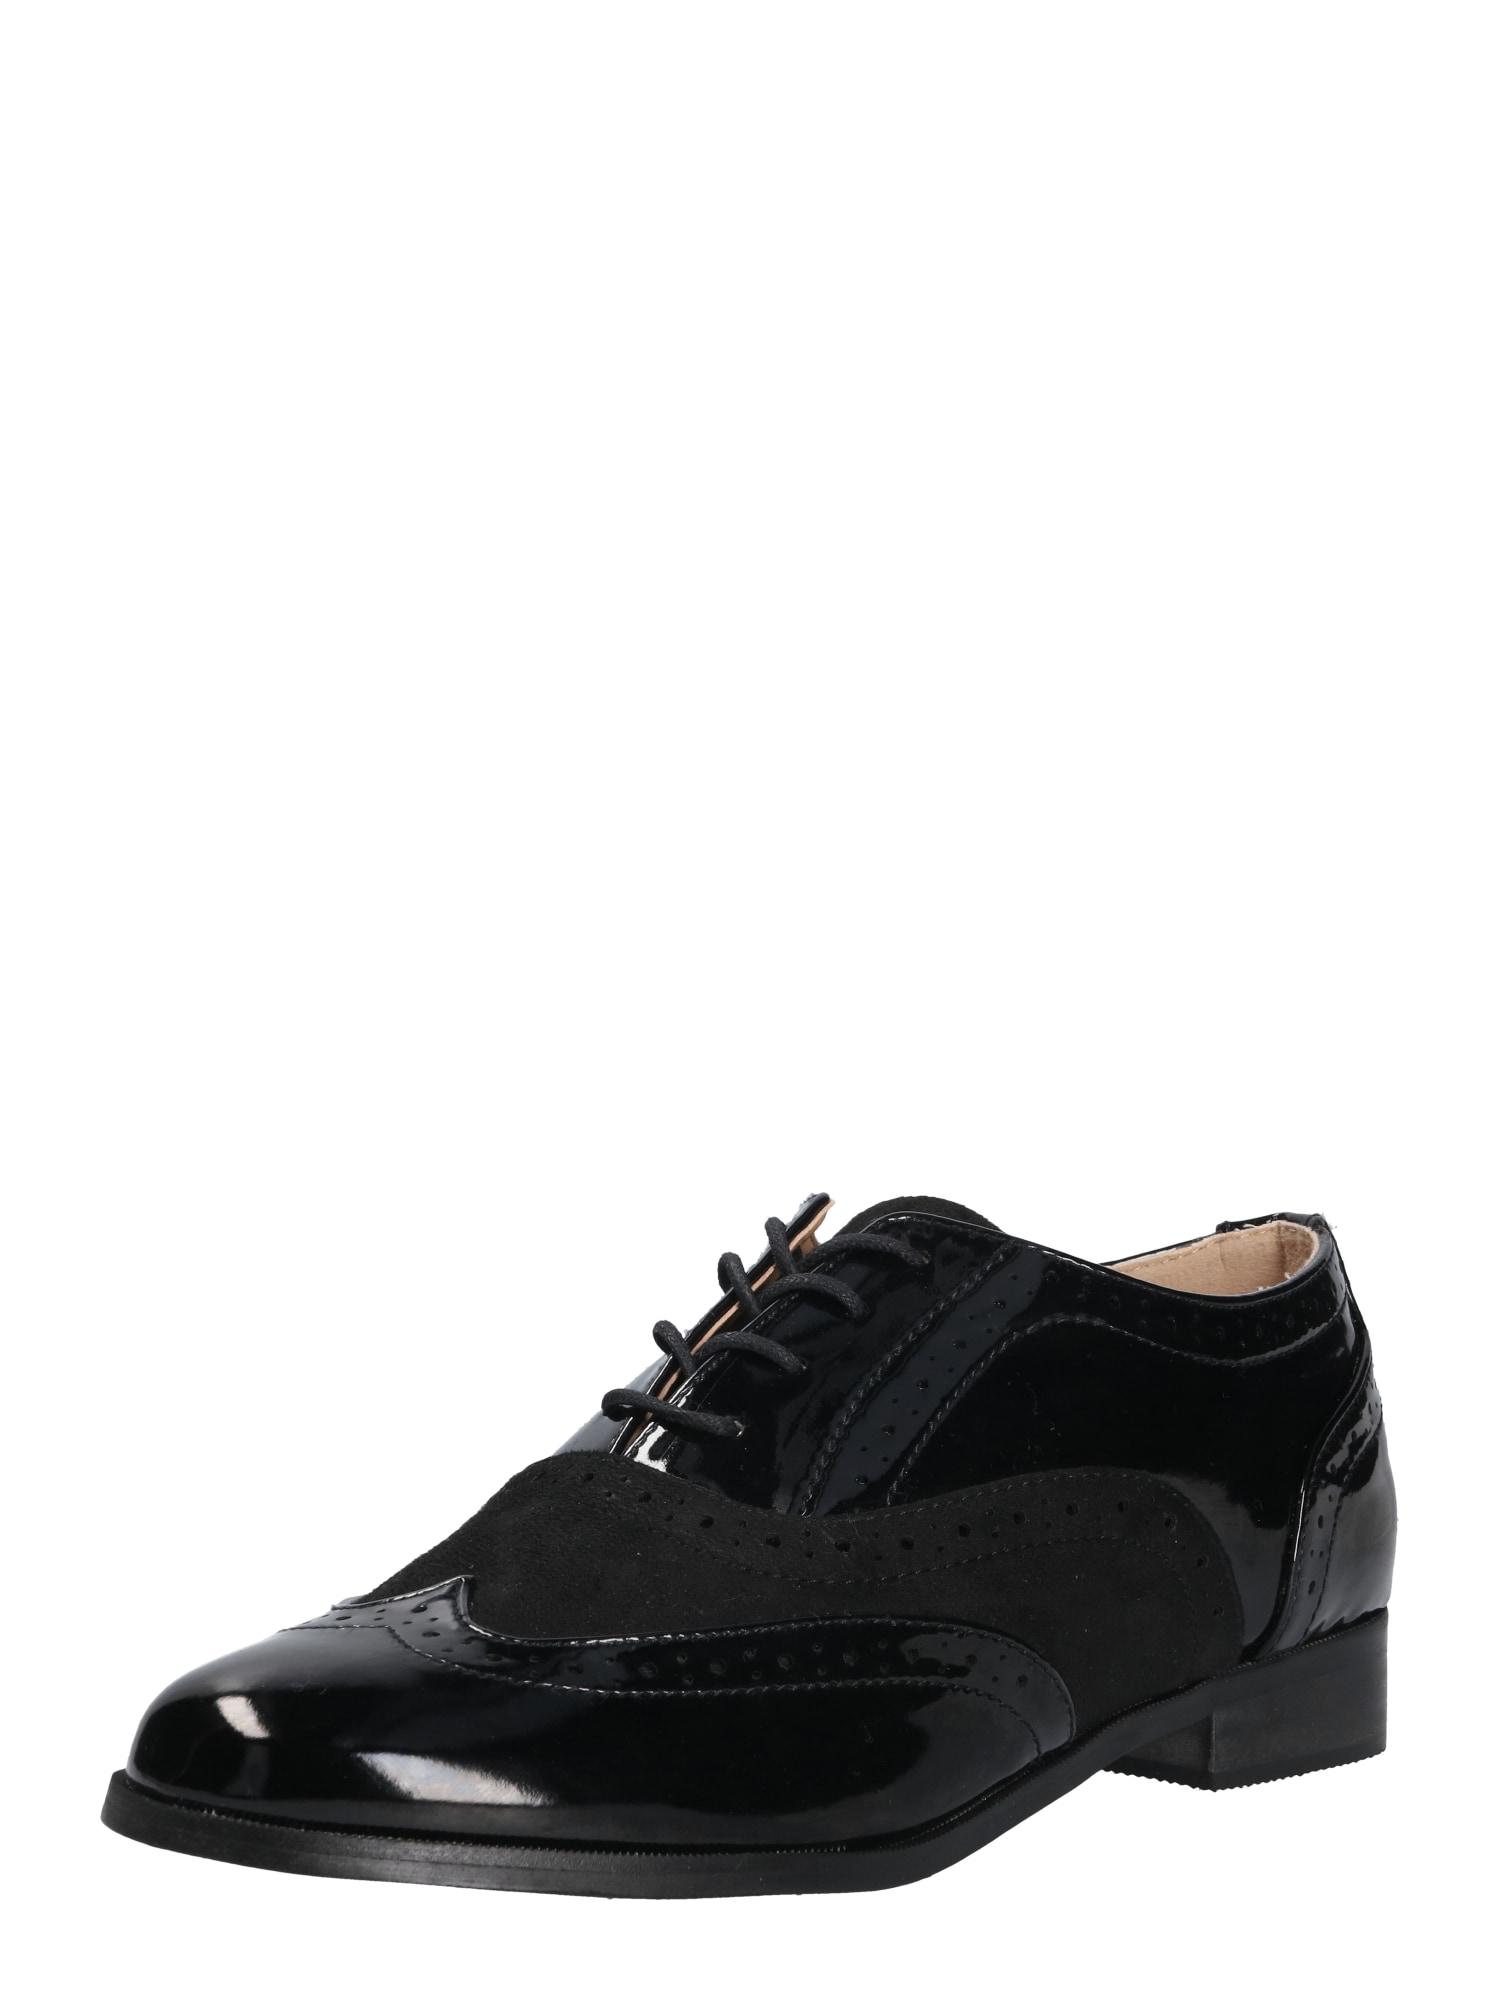 Šněrovací boty GWENNI černá Head Over Heels